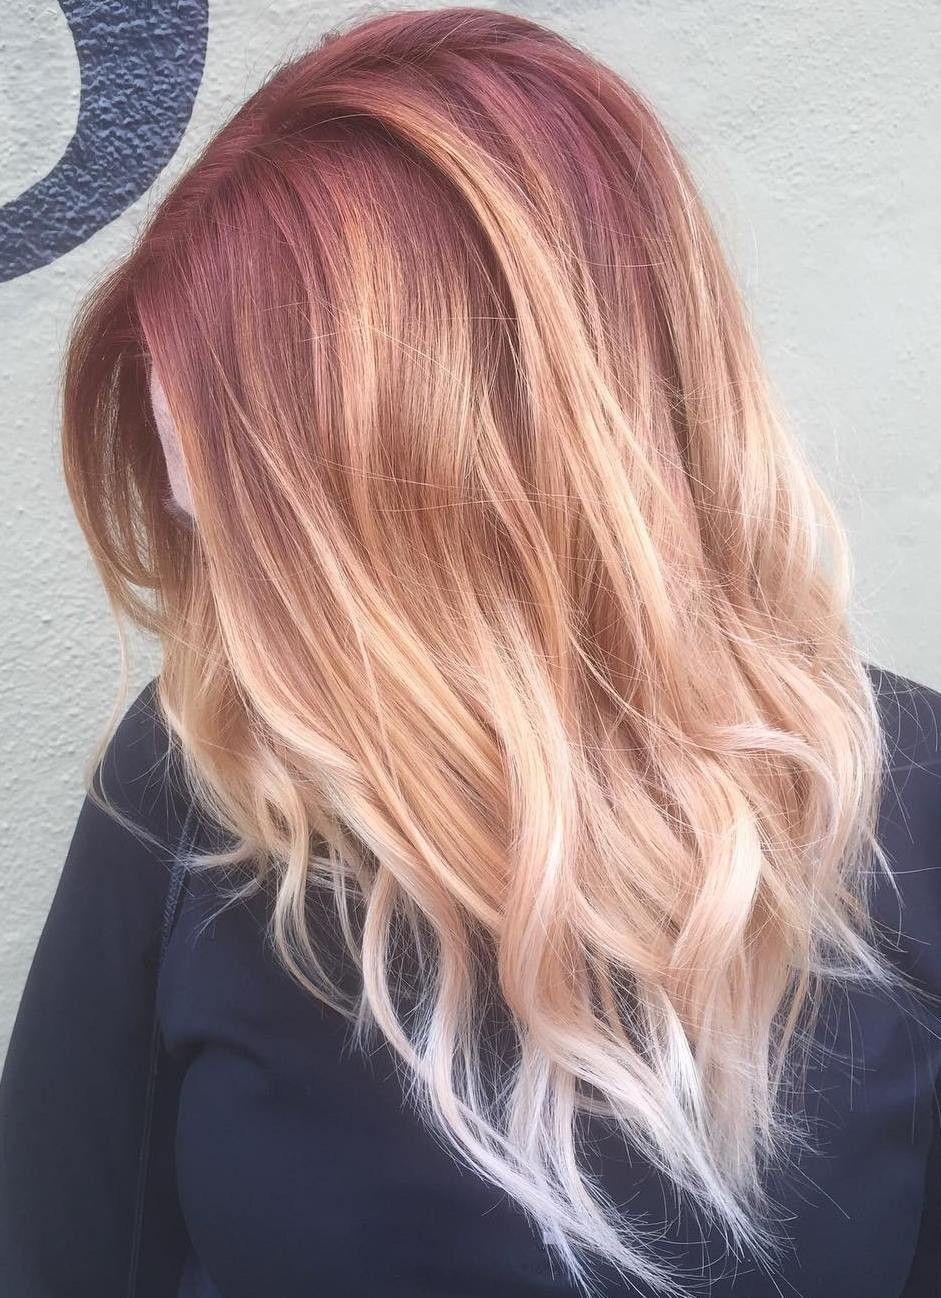 Pin by savannah penland on hair u fashion pinterest hair ombre